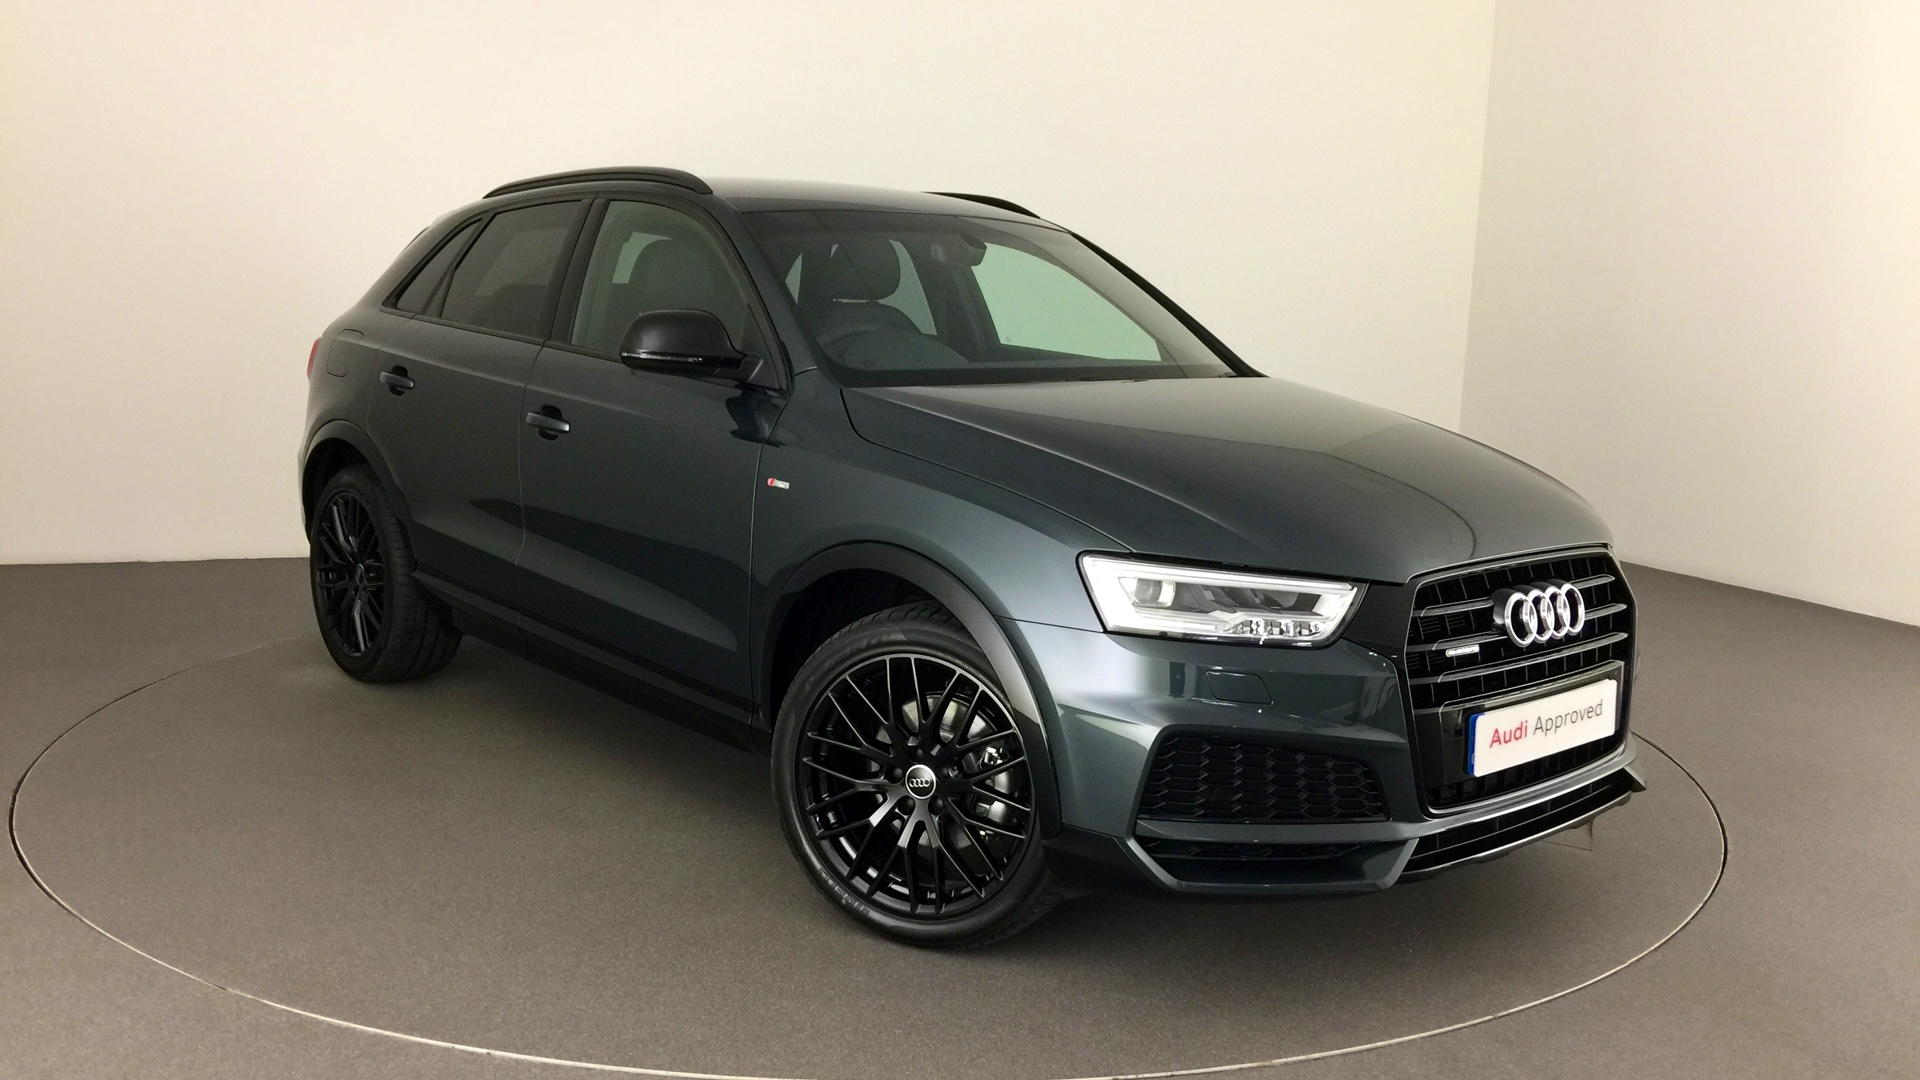 Audi Q3 Black Edition Www Pixshark Com Images